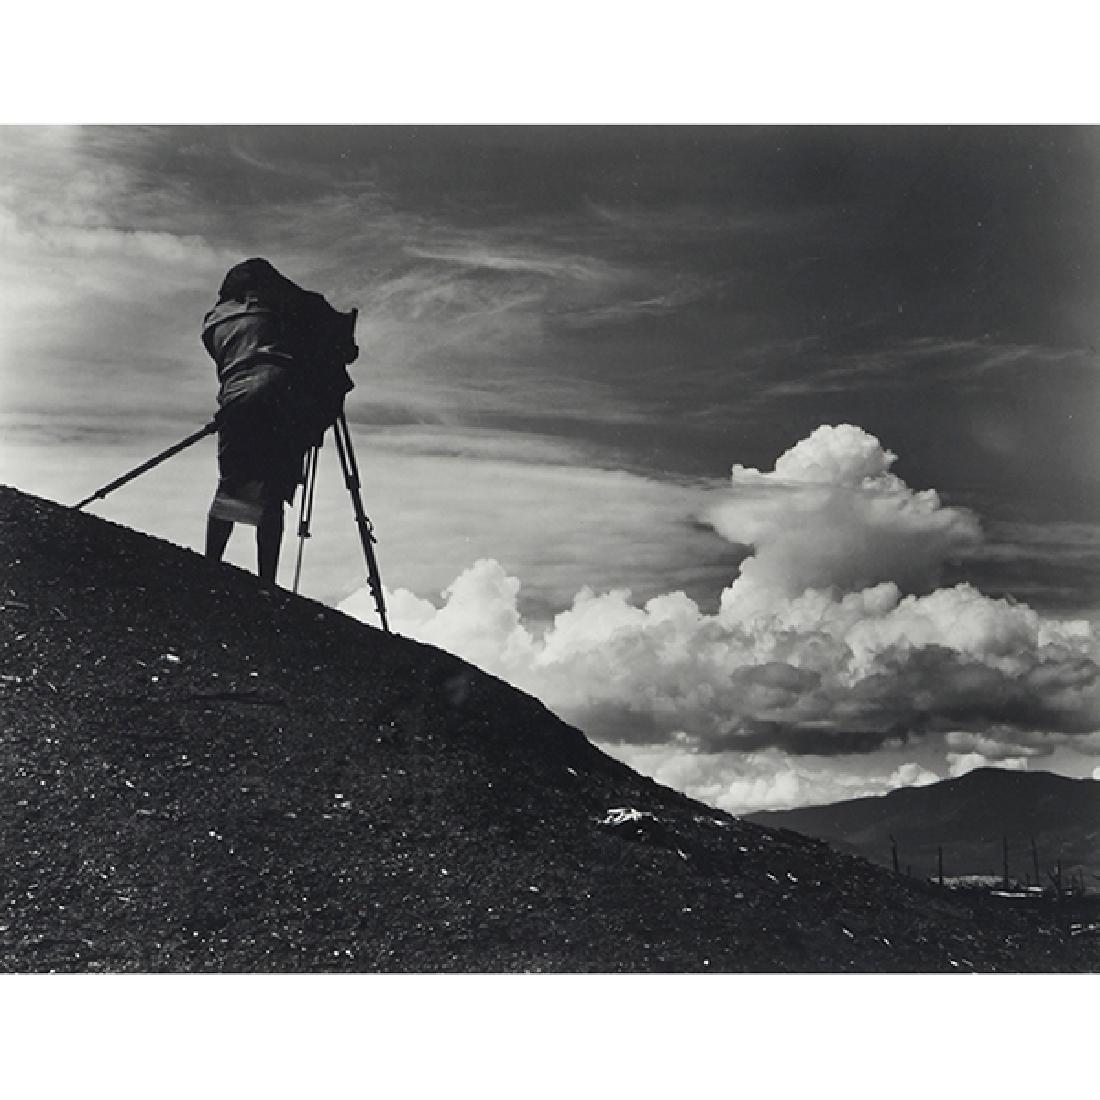 Willard Van Dyke, (American, 1906-1986), Sonya